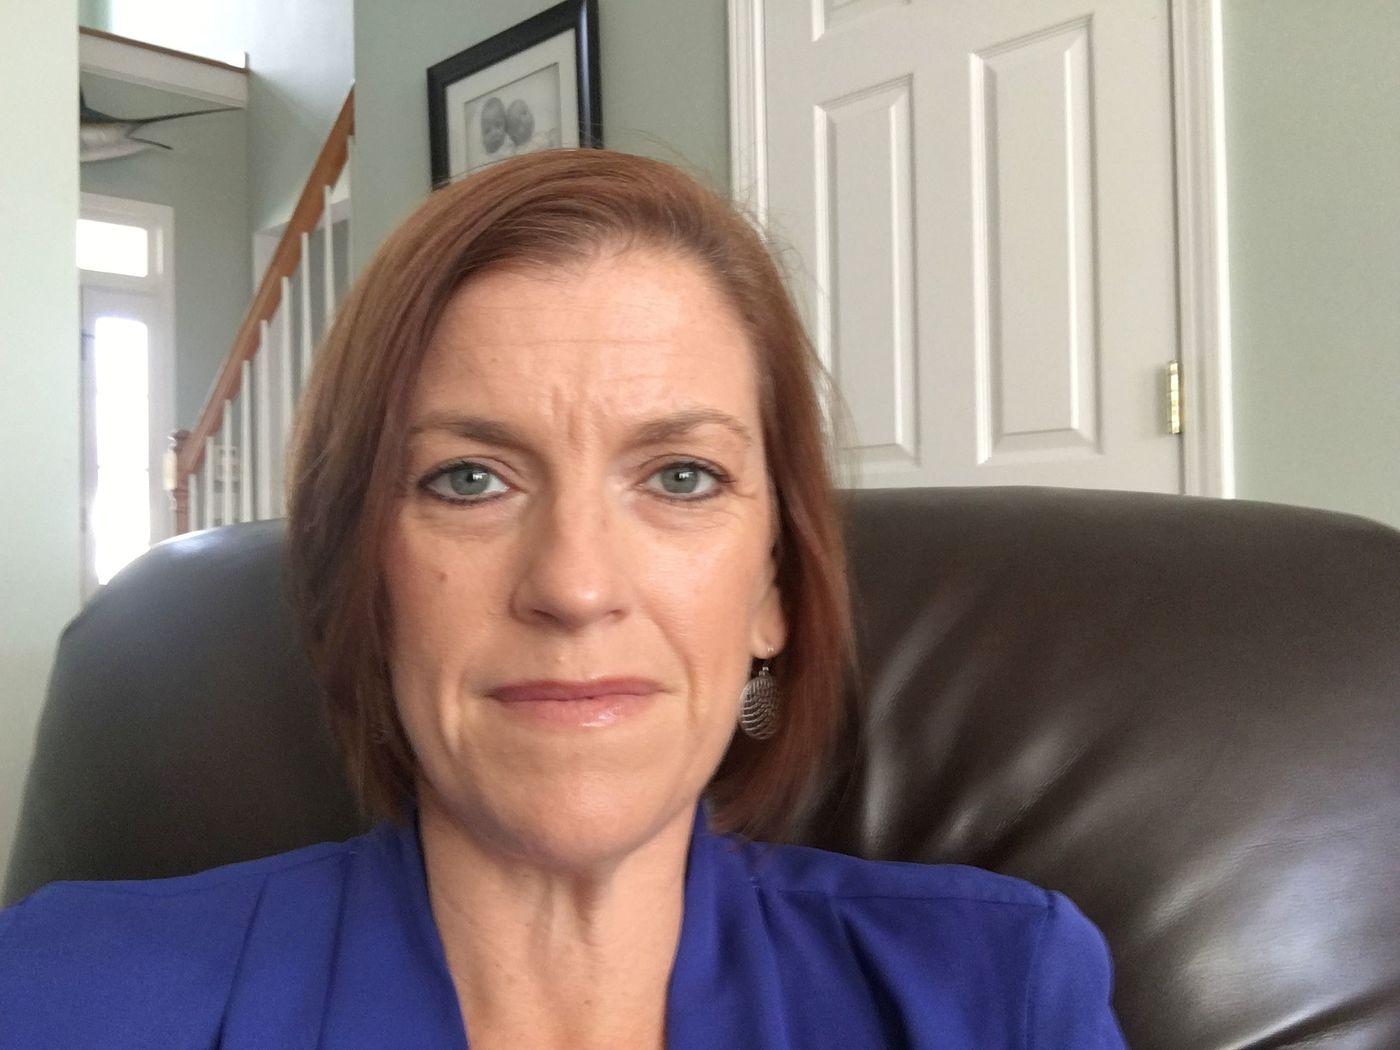 Melanie Cameron Realtor - Thinking of Selling